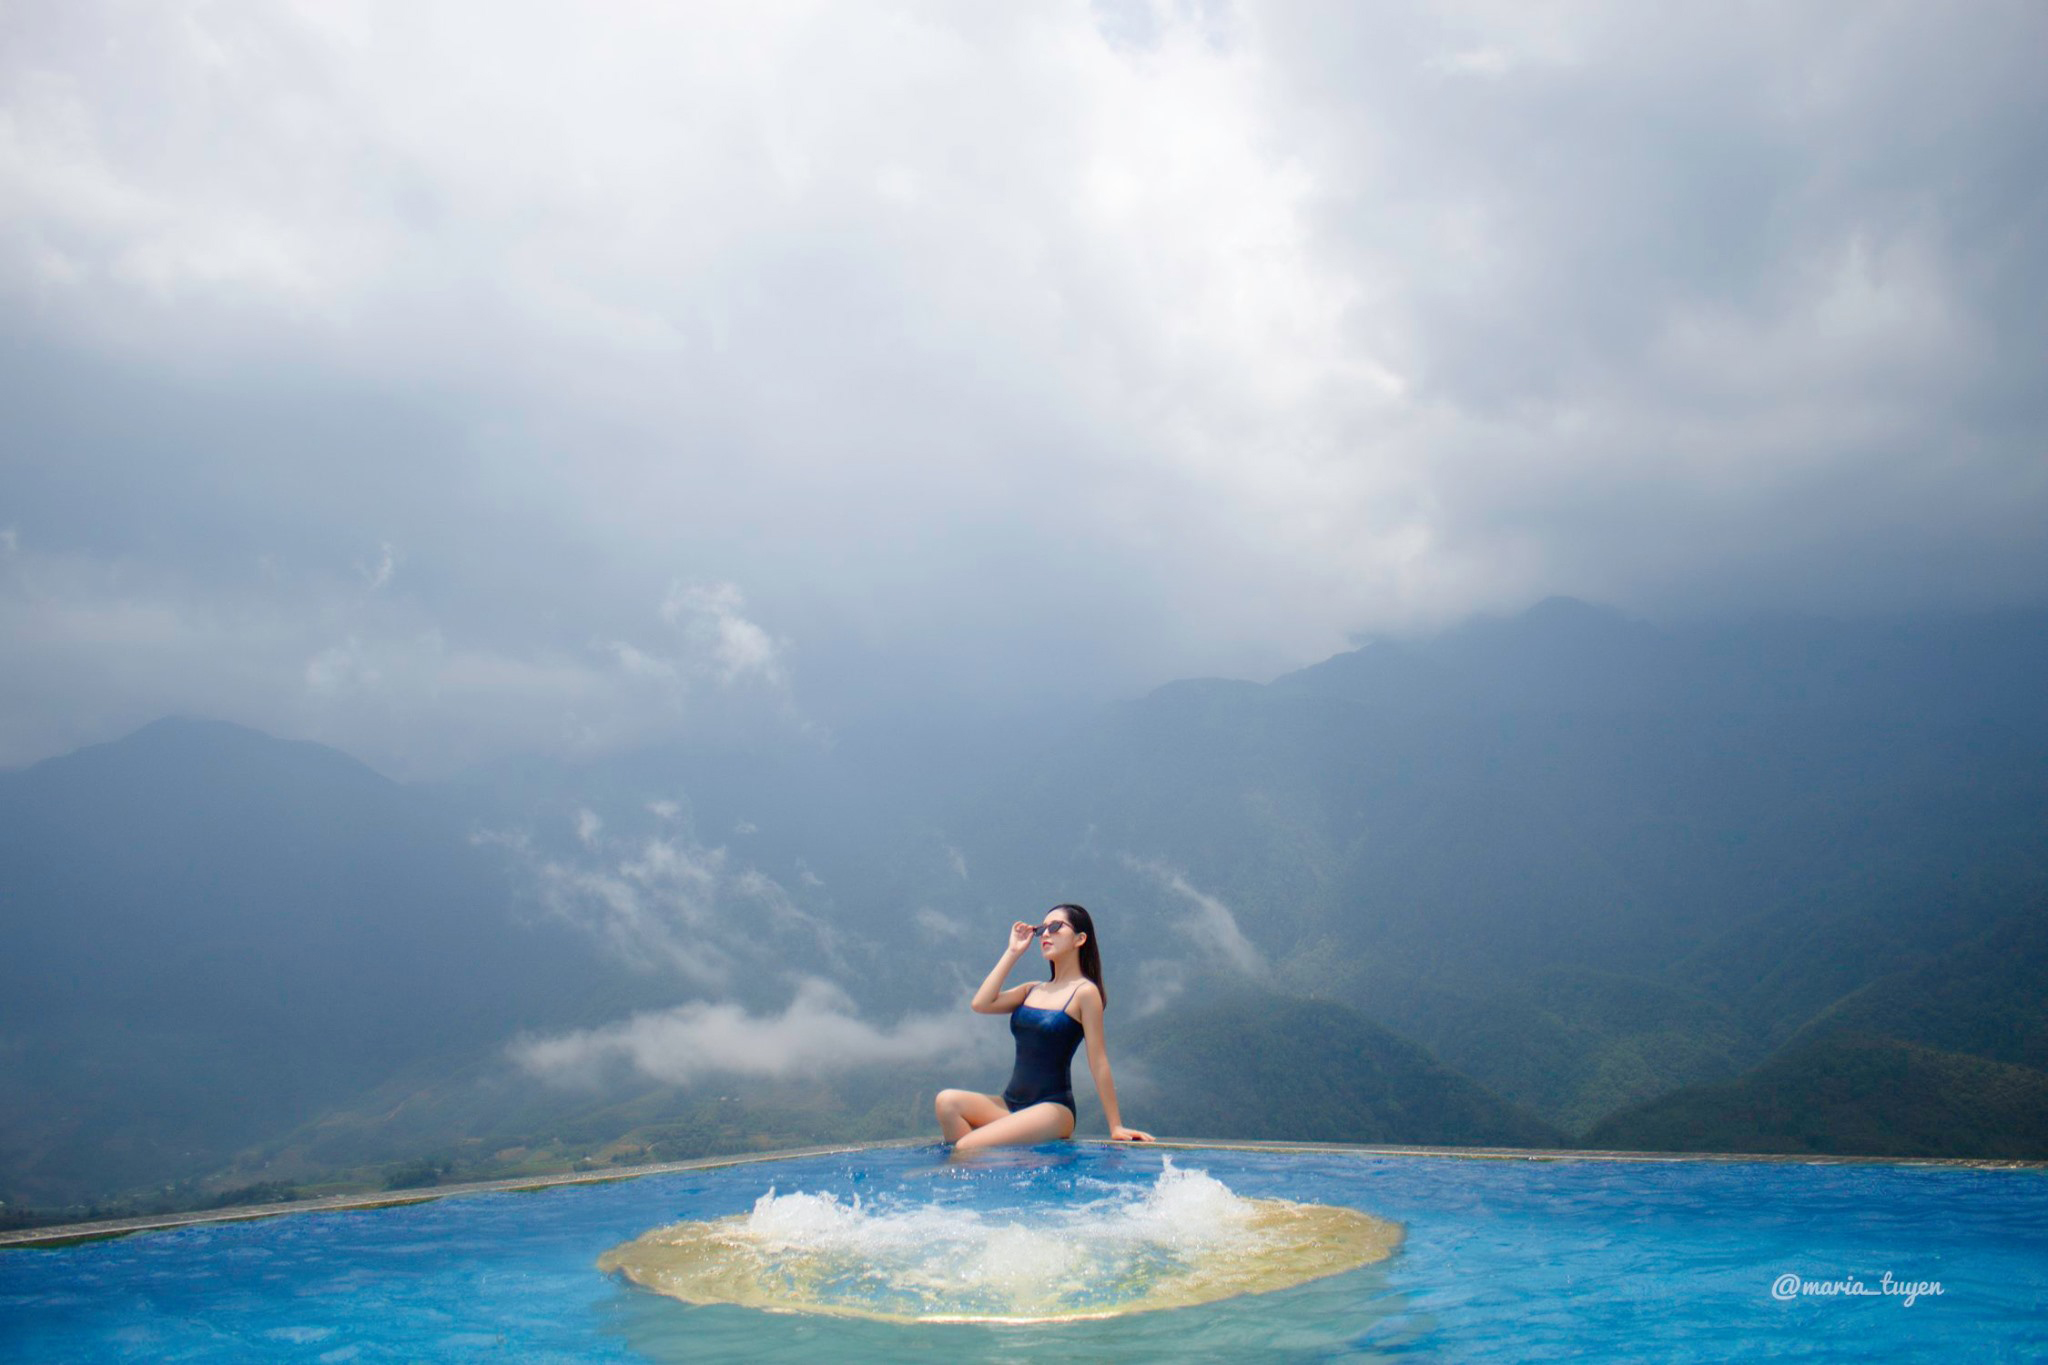 Pistachio Hotel Sapa Hồ Bơi dát vàng